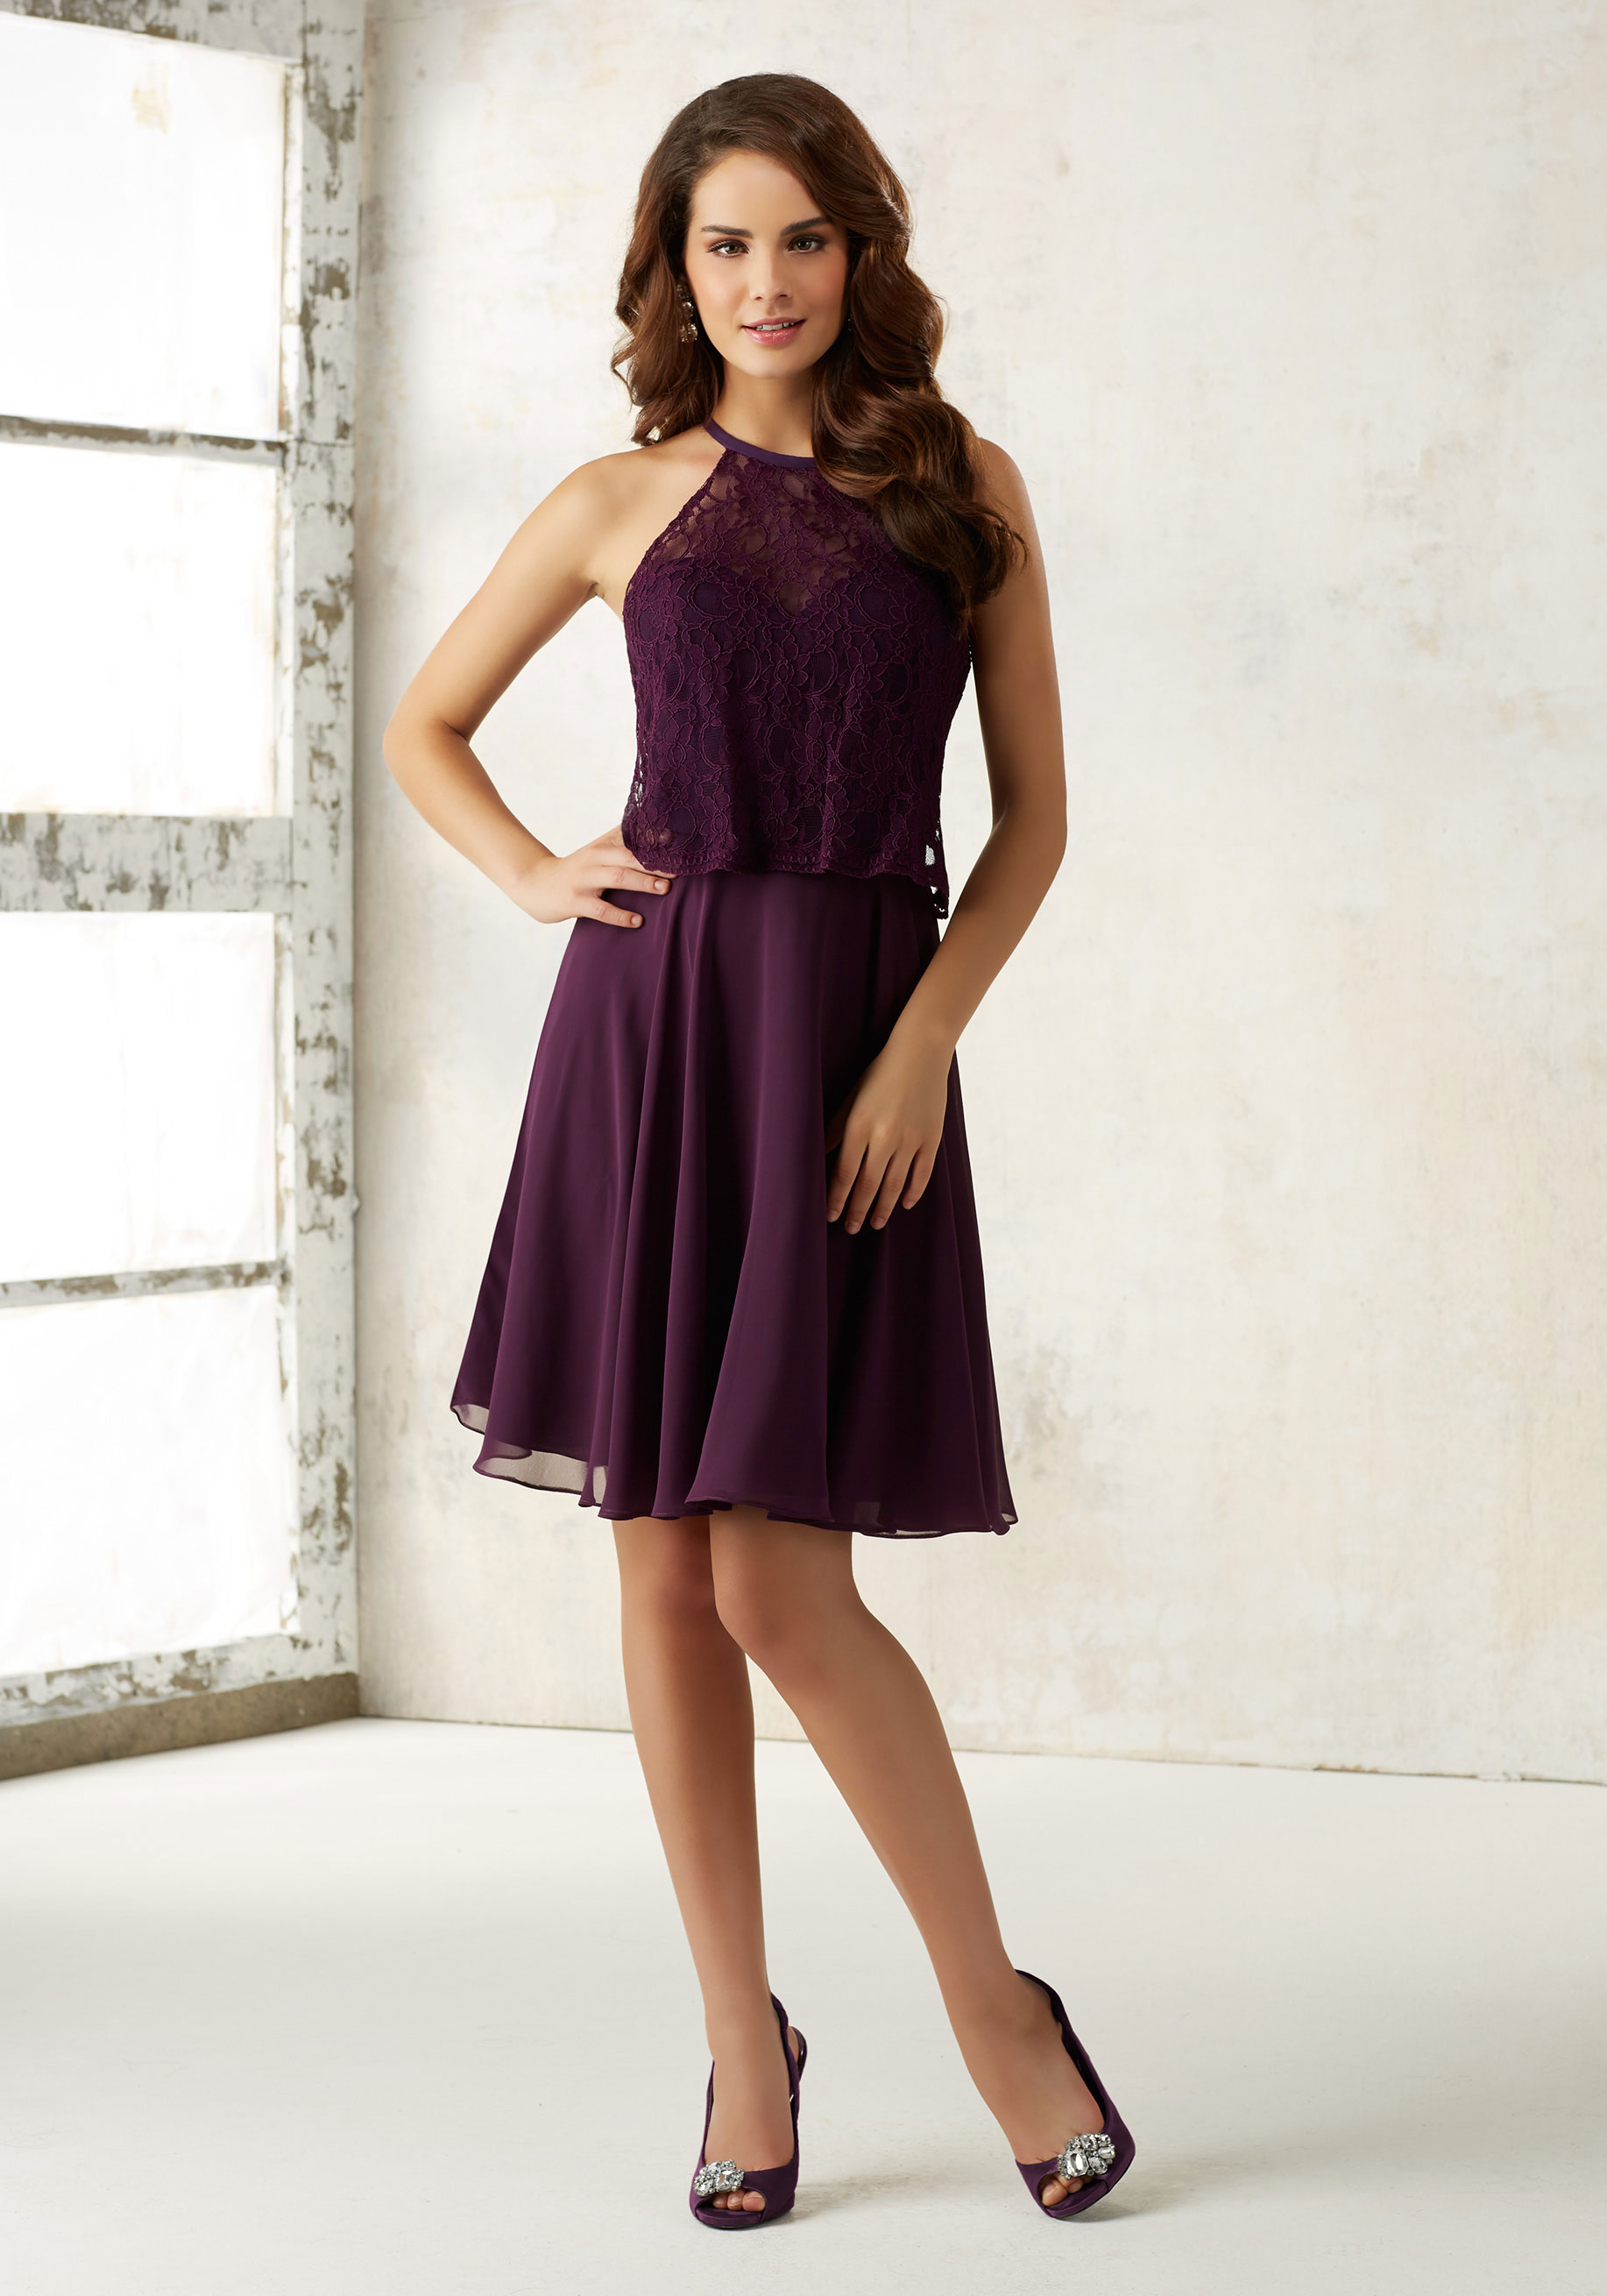 D396 Halter Short Homecoming Dress, Knee Length Short Prom Gowns ...